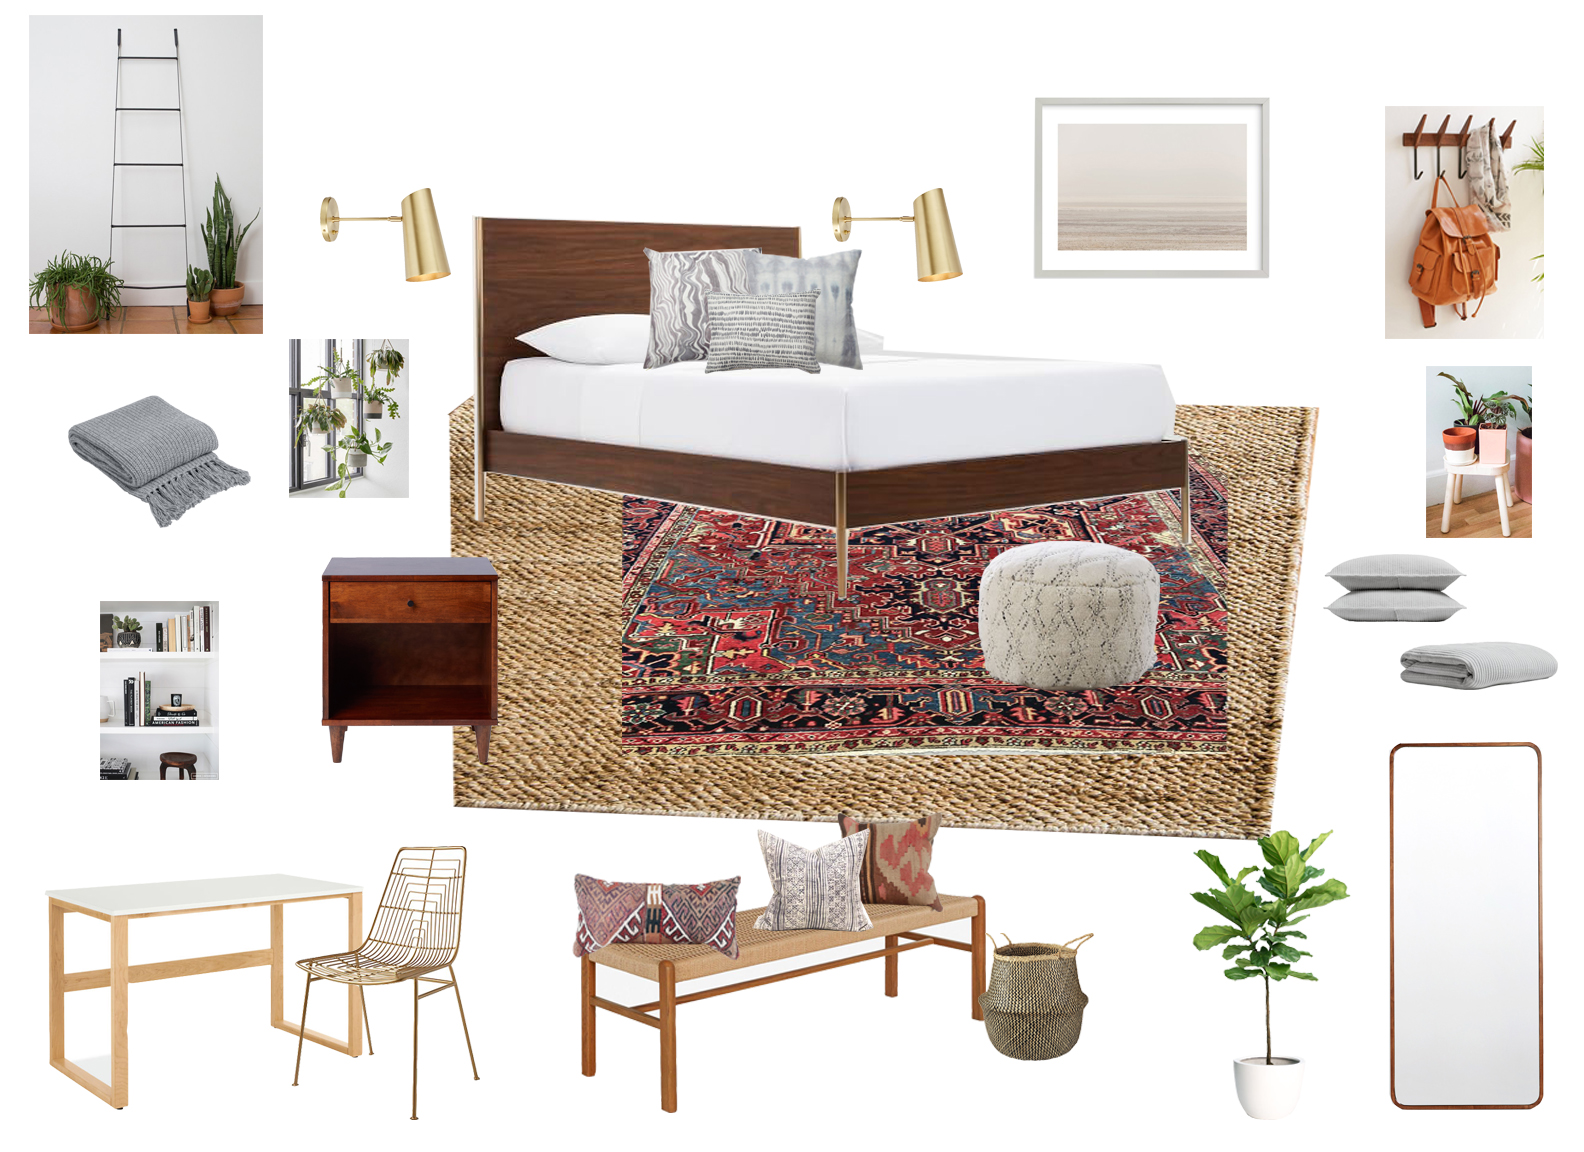 anita yokota master bedroom mood board california eclectic design